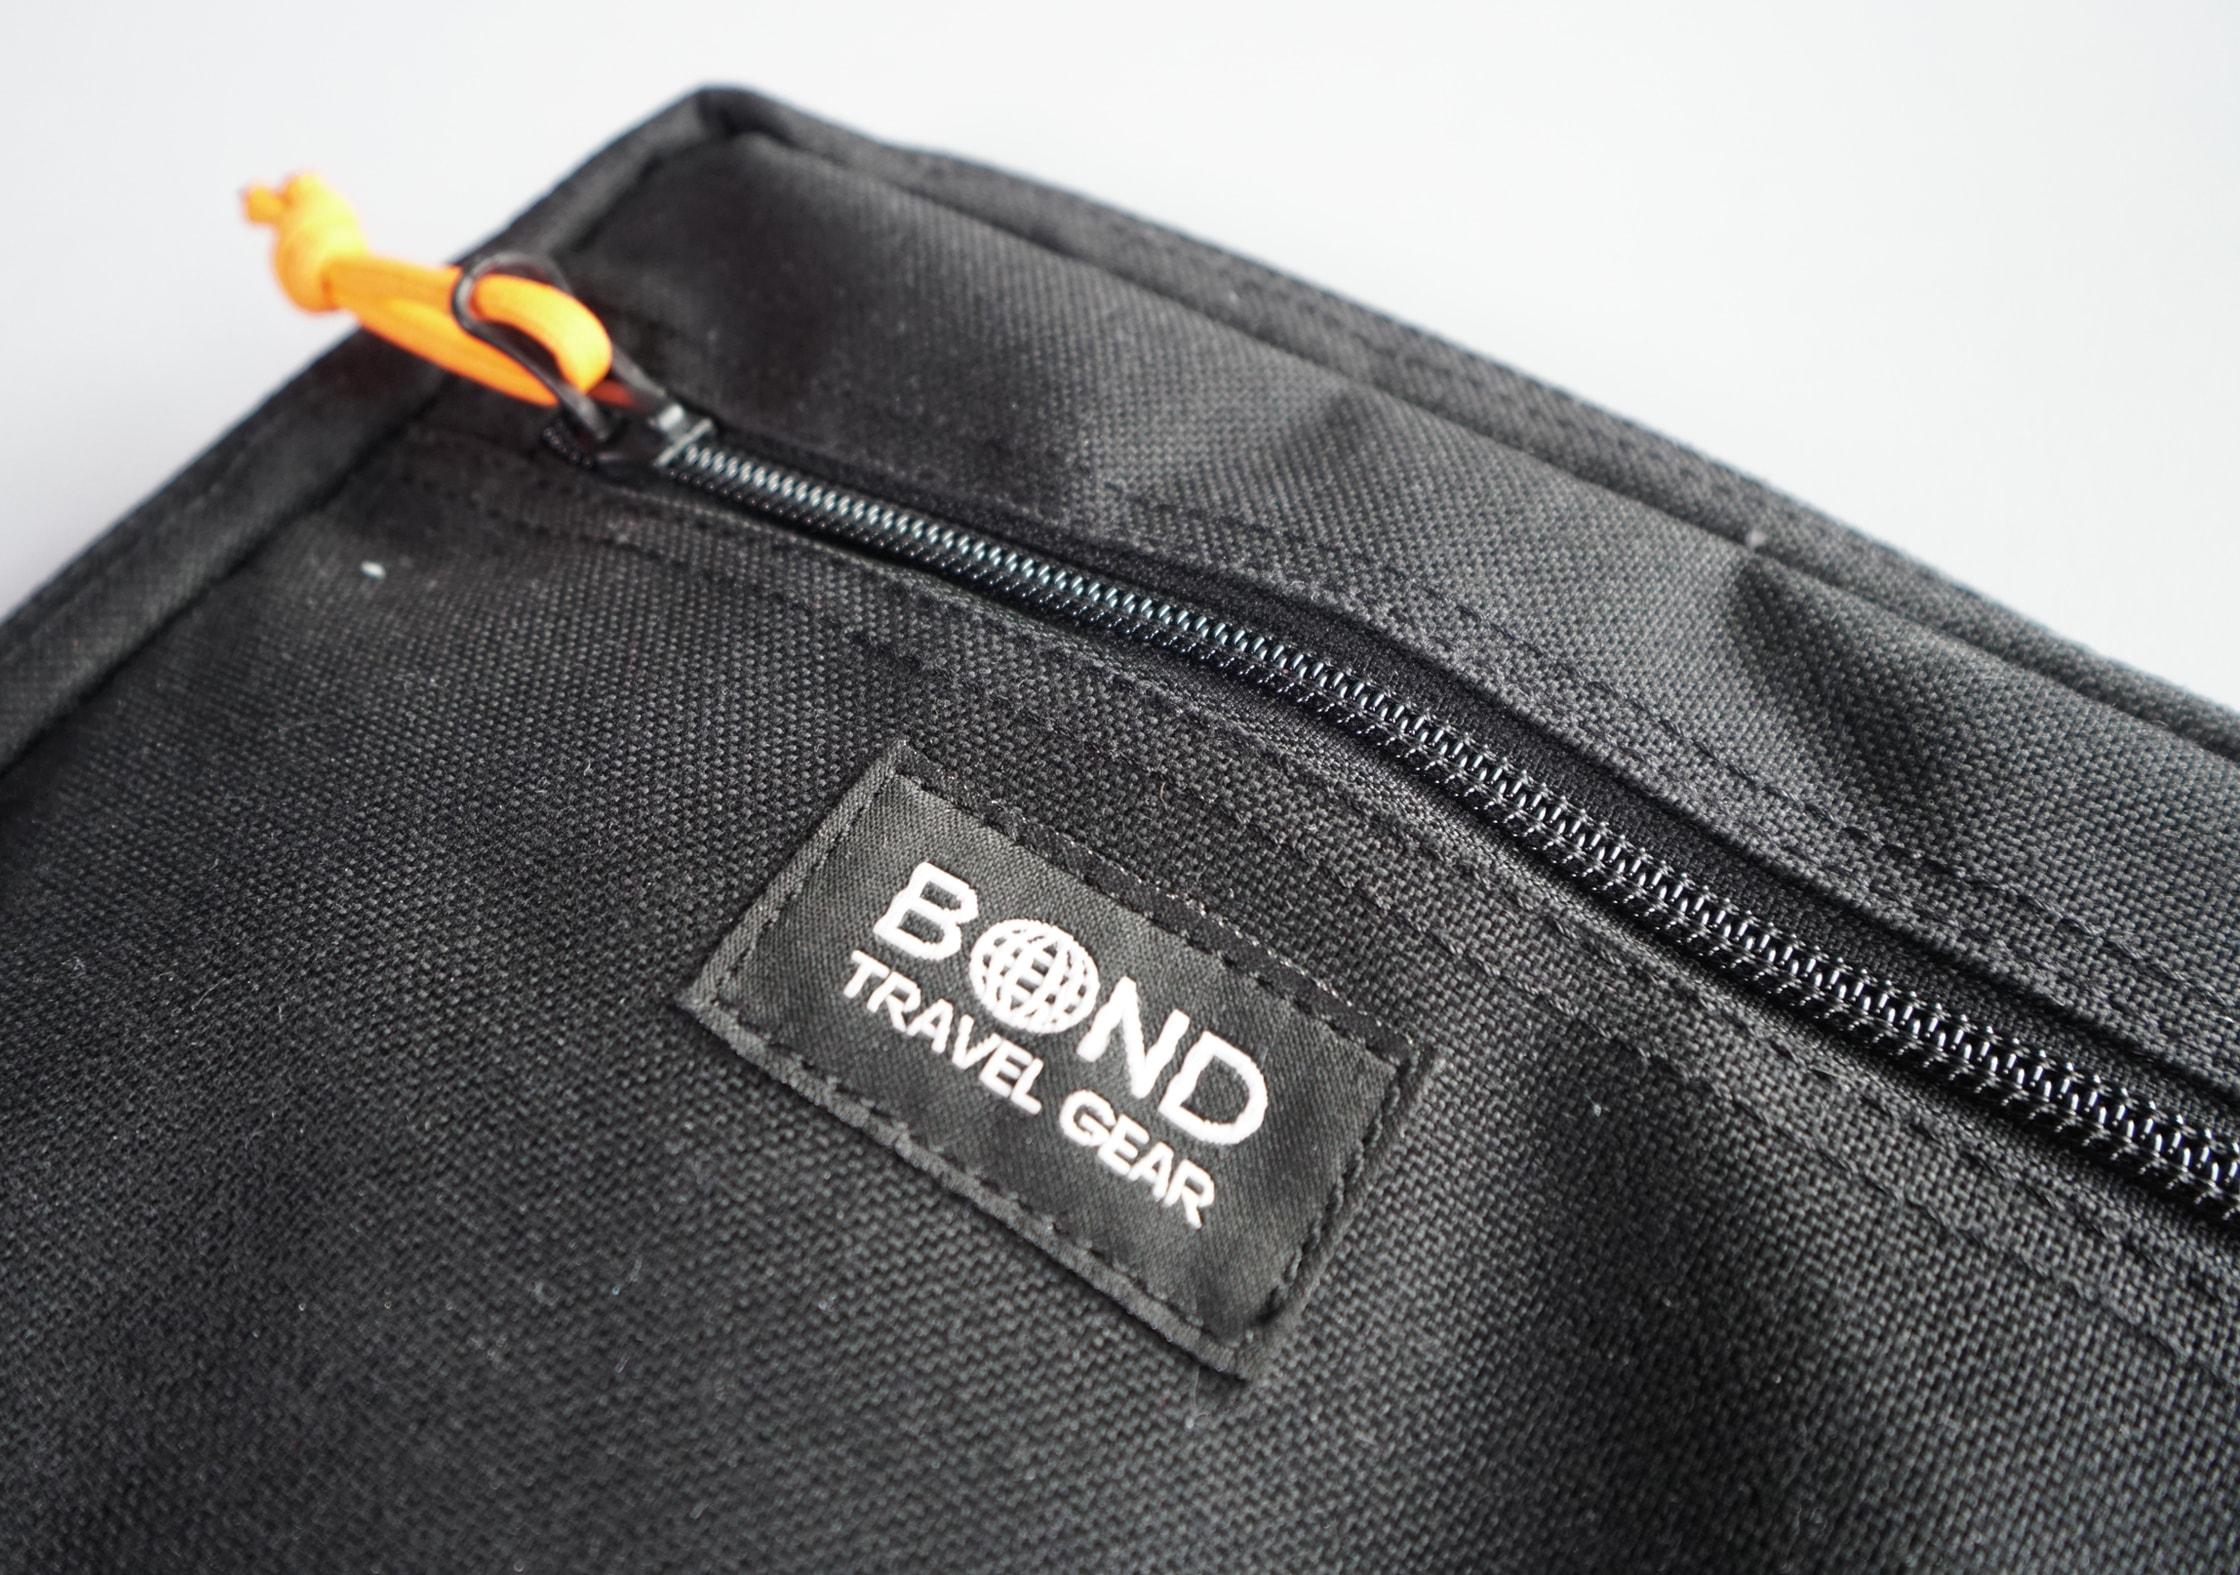 Bond ESCAPADE Small Gear Pouch